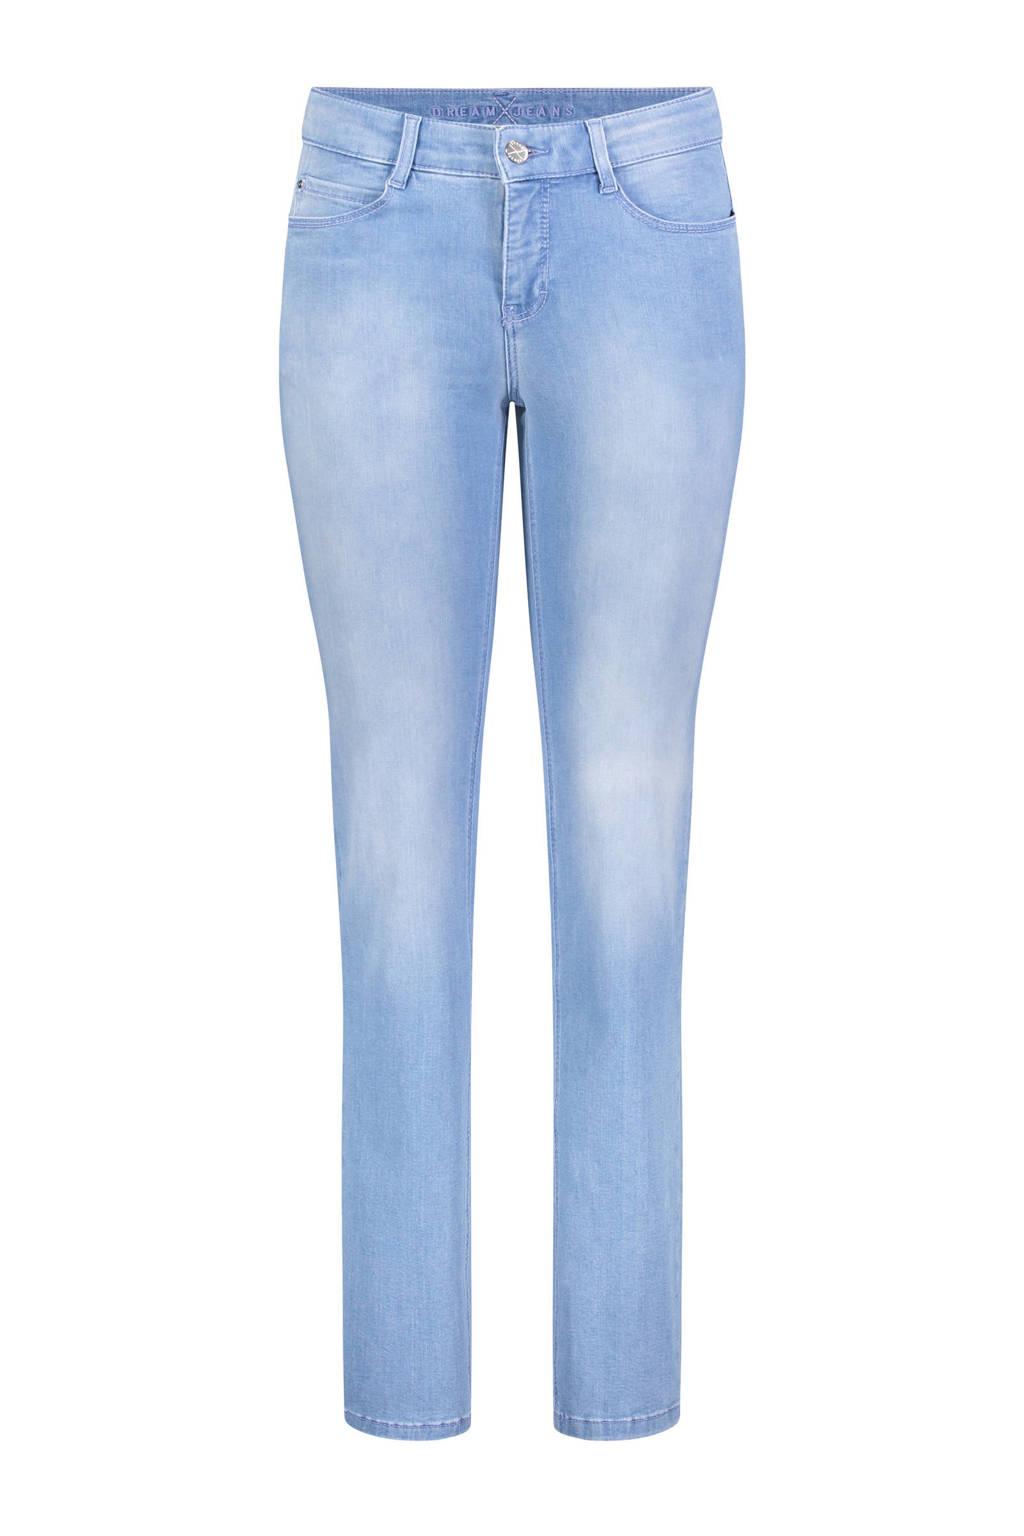 MAC straight fit jeans Dream d491 basic bleached blue, D491 basic bleached blue